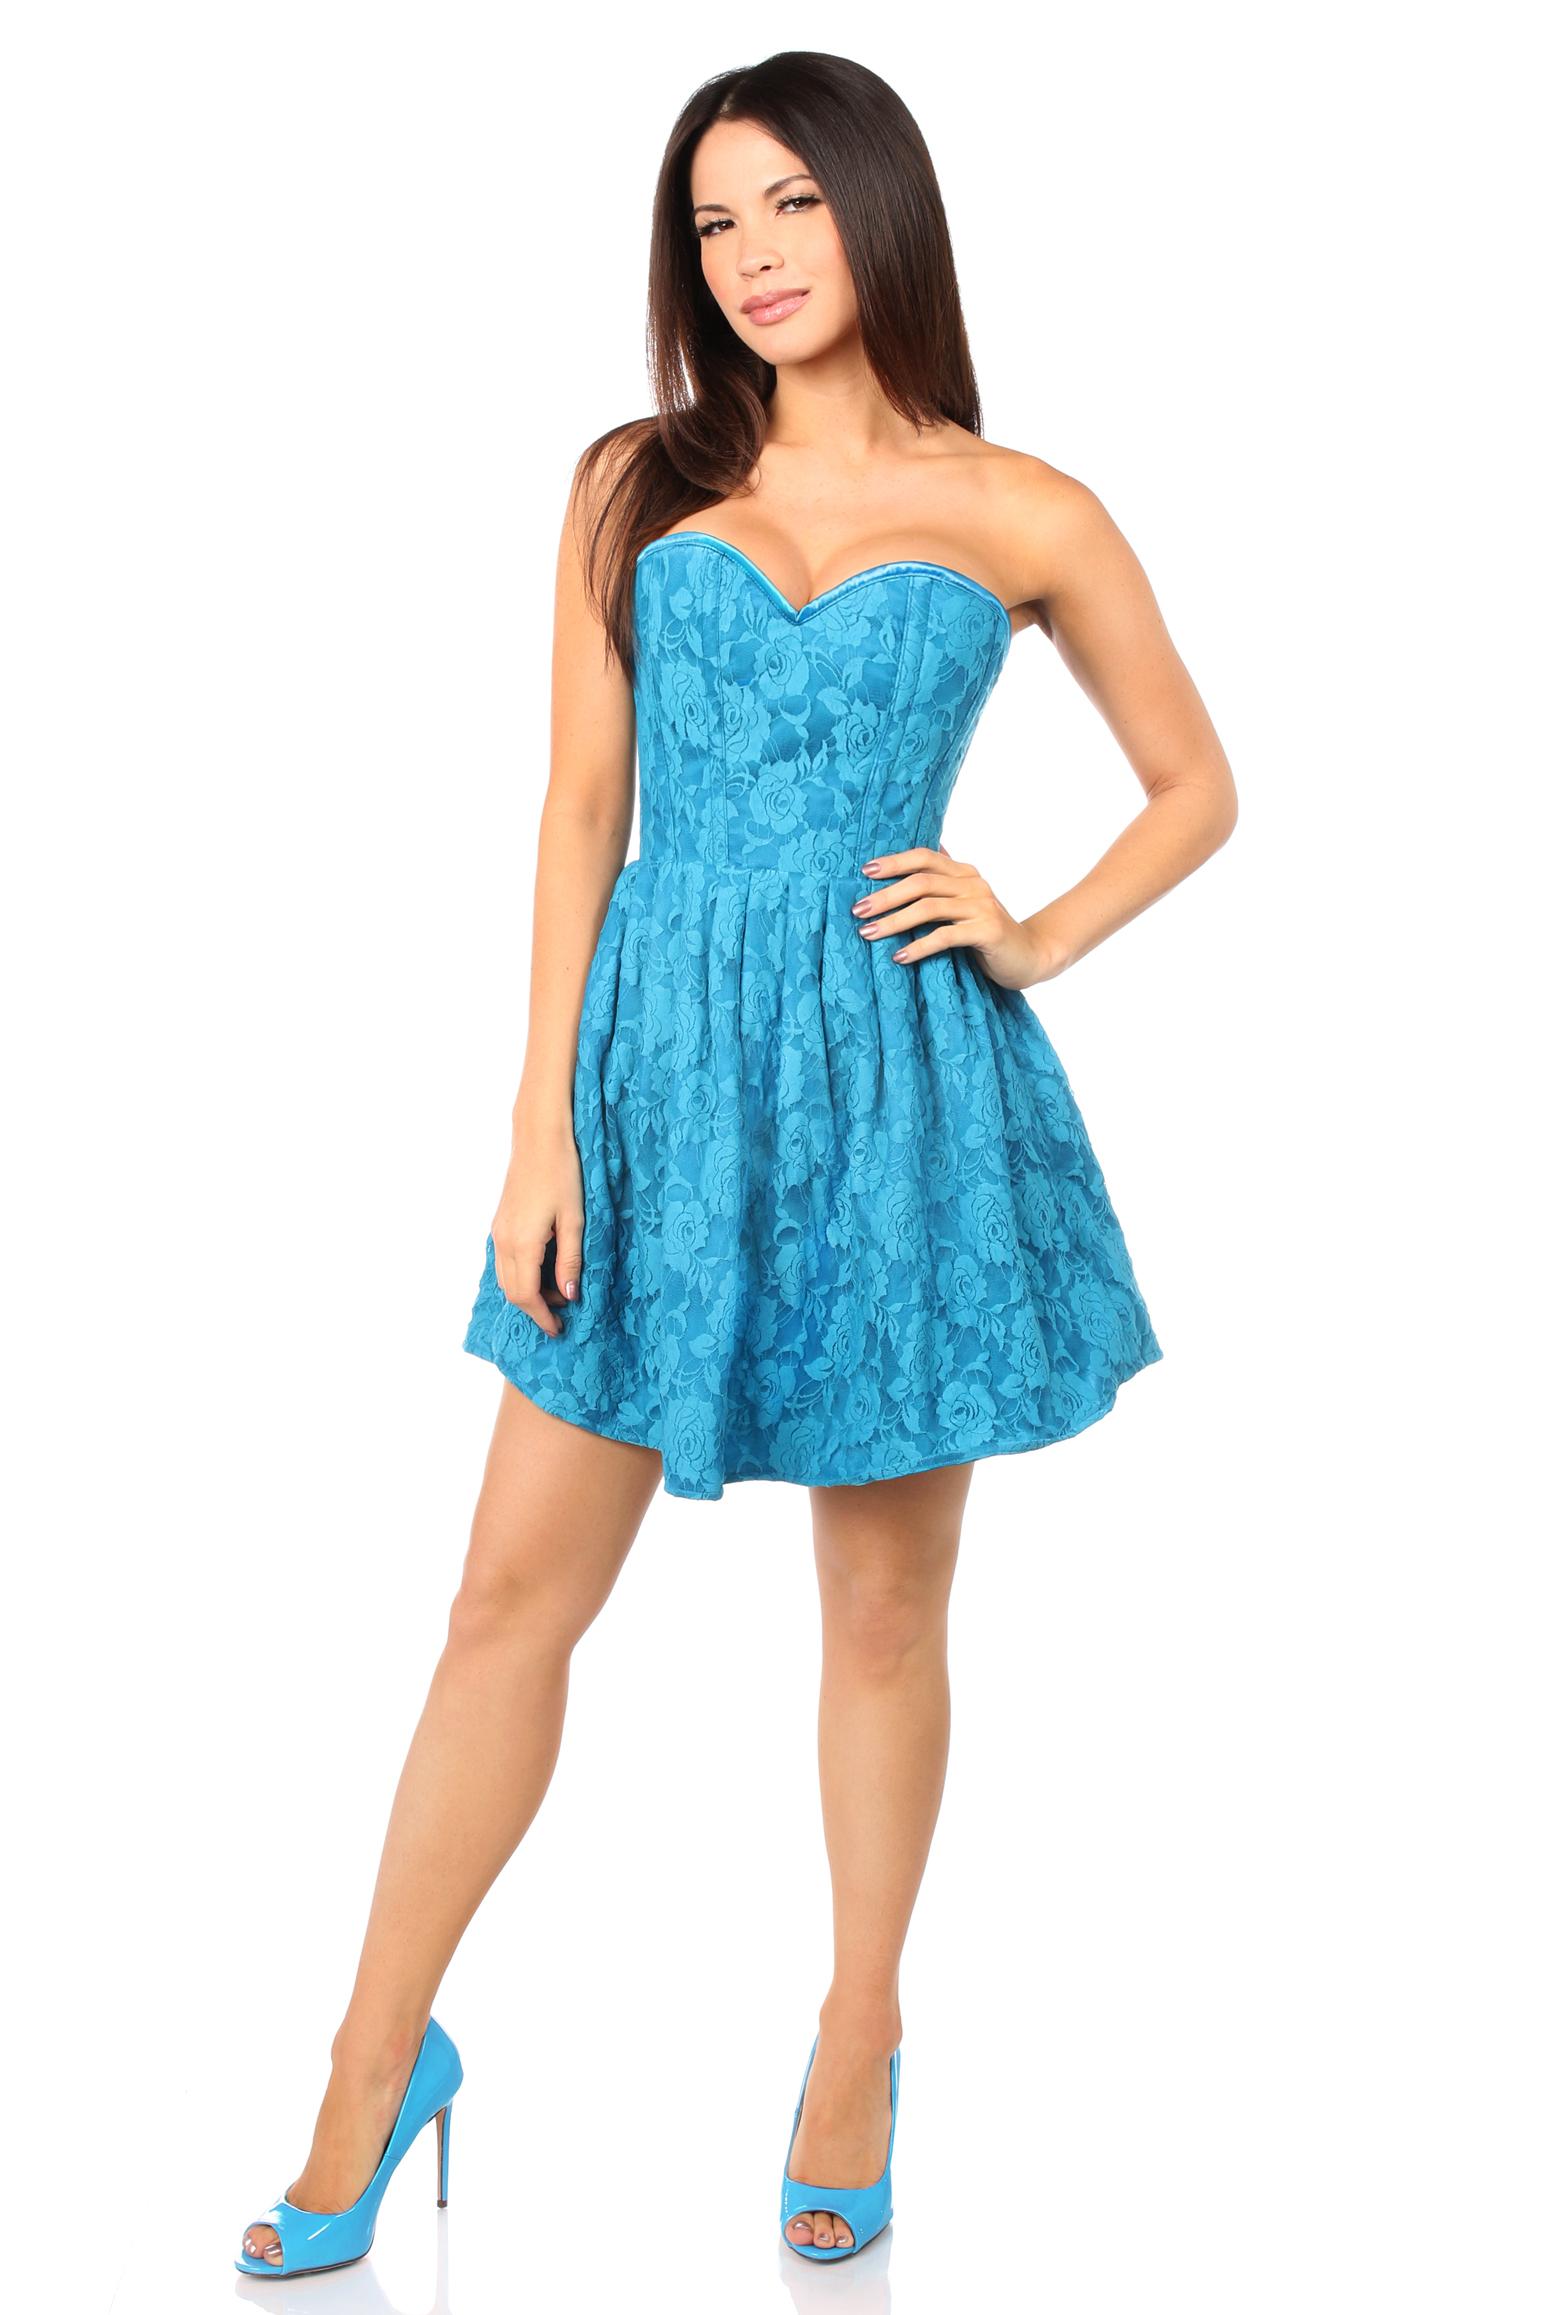 Top Drawer Steel Boned Teal Lace Empire Waist Corset Dress DASTD-599